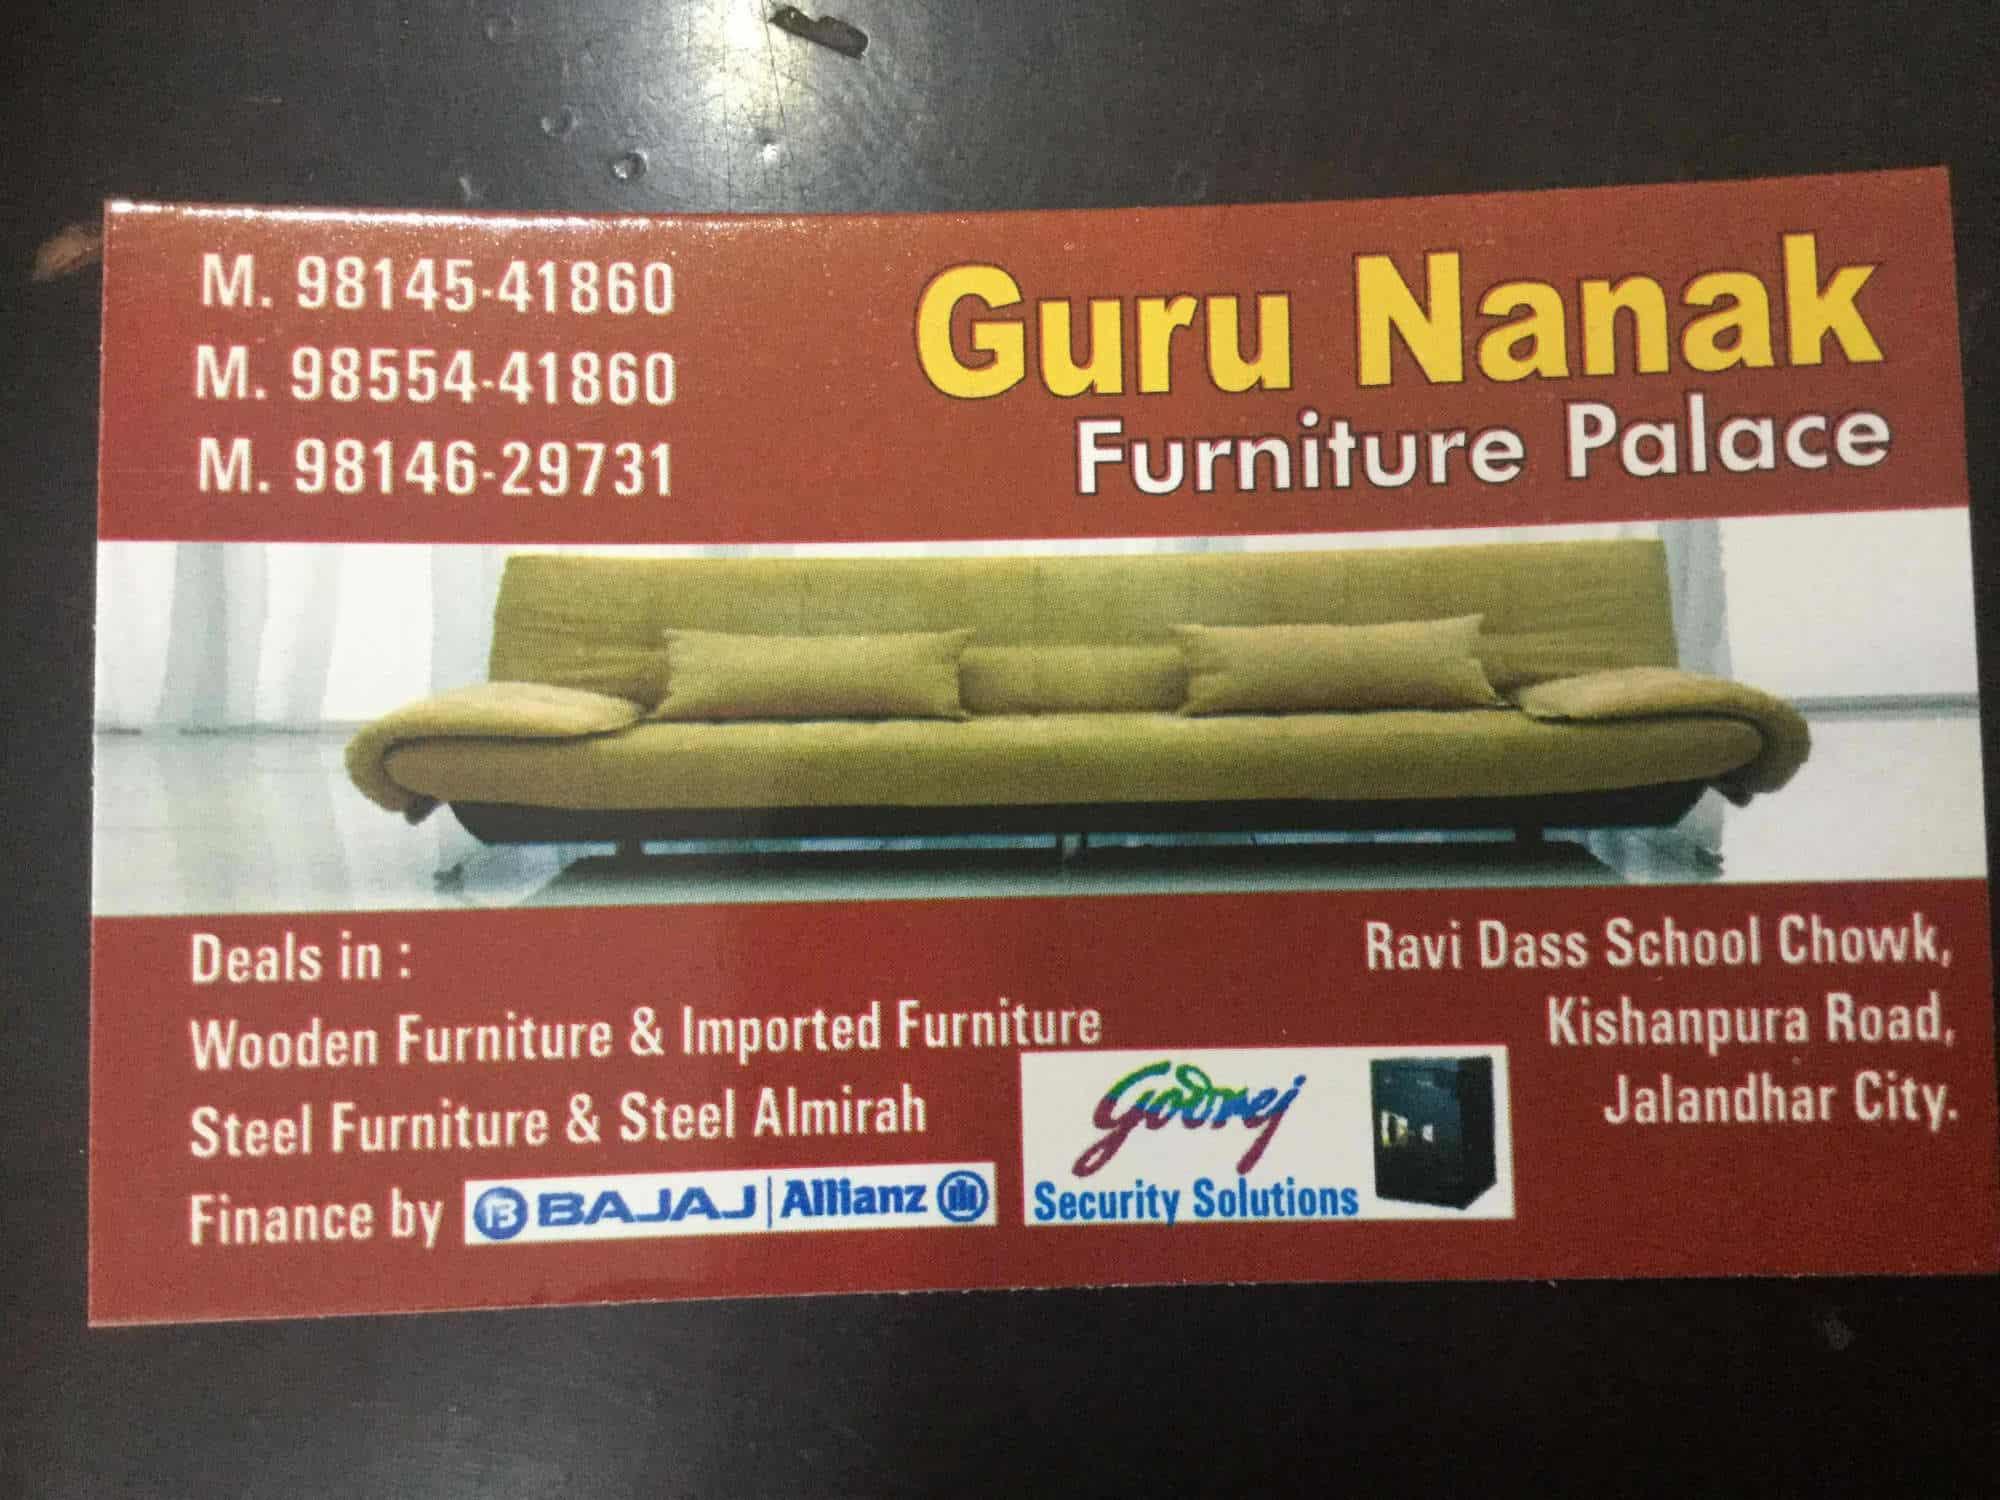 Guru Nanak Furniture Palace Jalandhar City Carpenters in